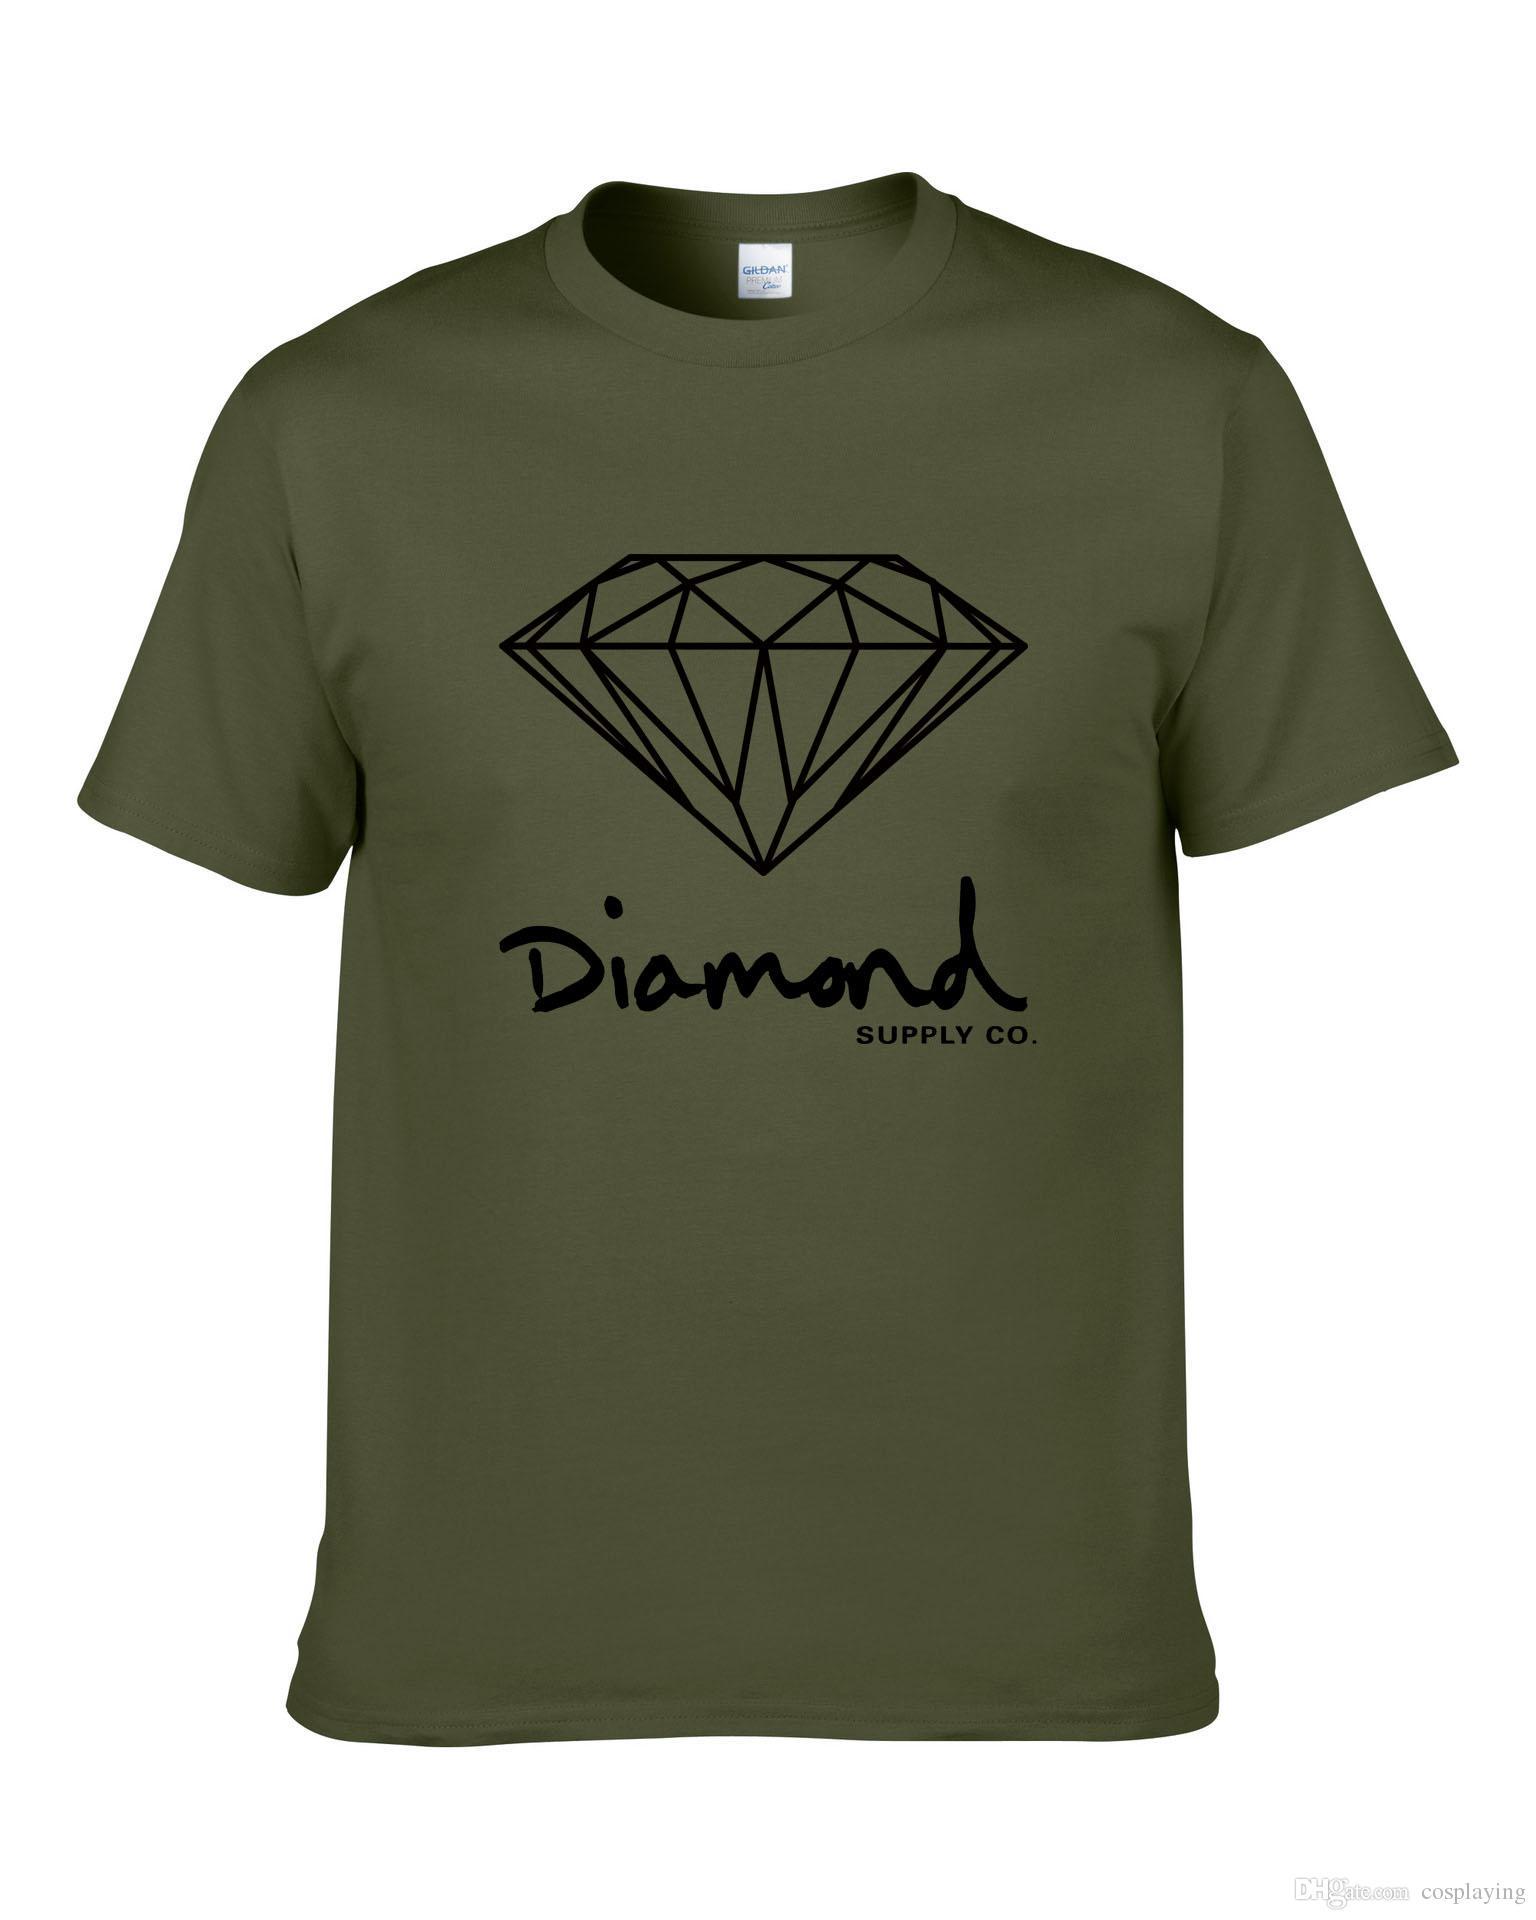 Diamond Supply Co gedruckt T-Shirt Herrenmode Marke Design Kleidung MAle South Coast Harajuku Skate Hip Hop Kurzarm-Sportbekleidung